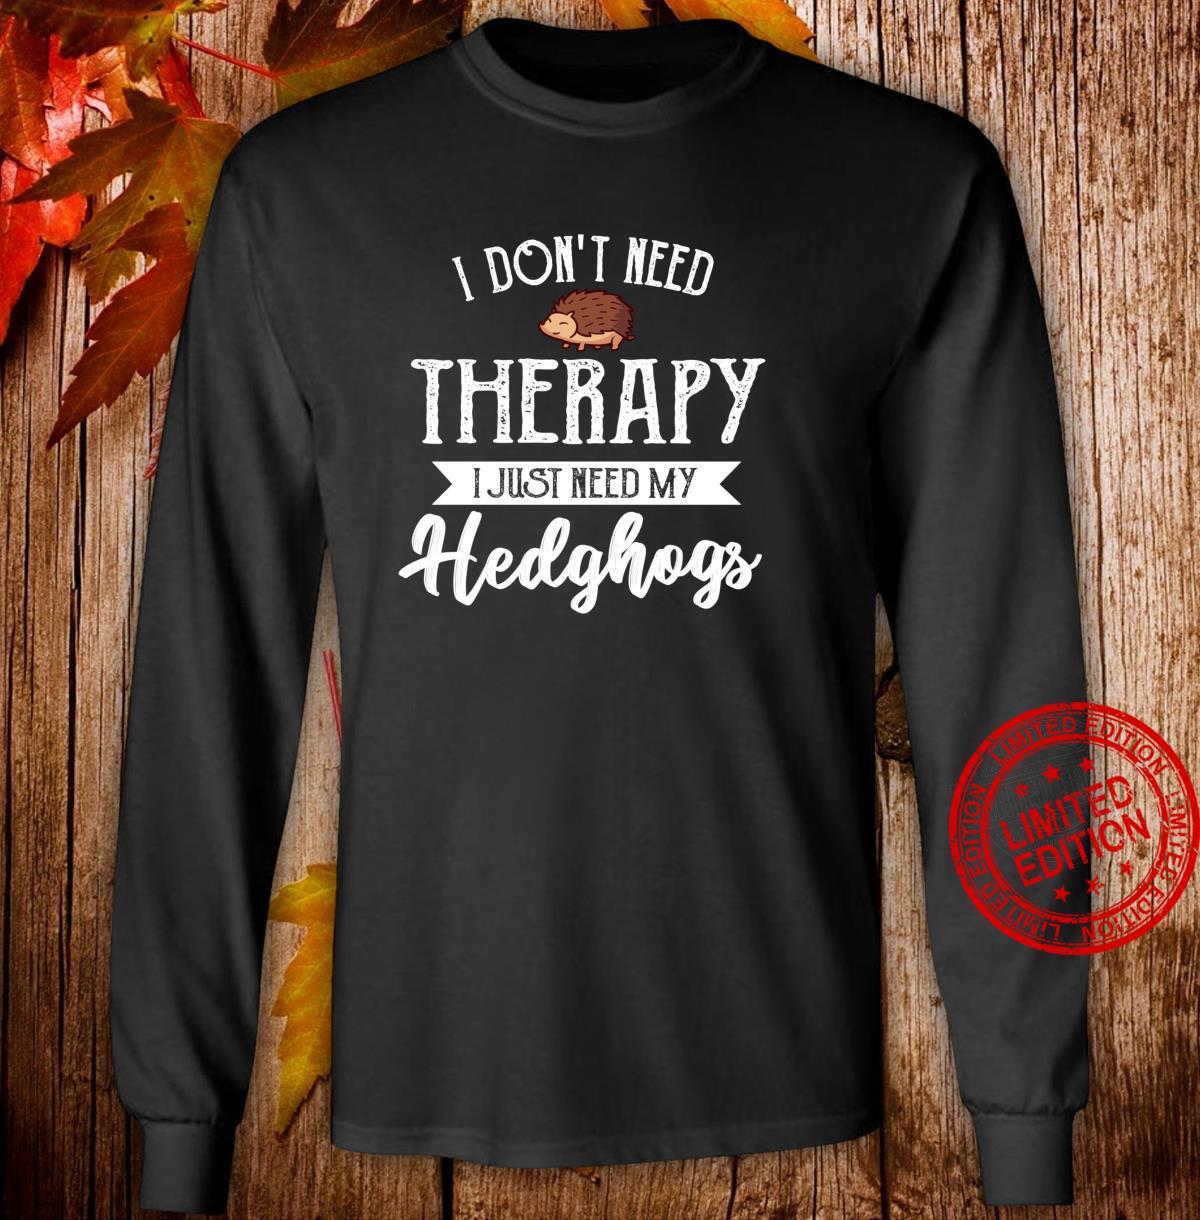 Keine Therapie Hedgehog Kleidung Kostüm Geschenk Igel Langarmshirt Shirt long sleeved